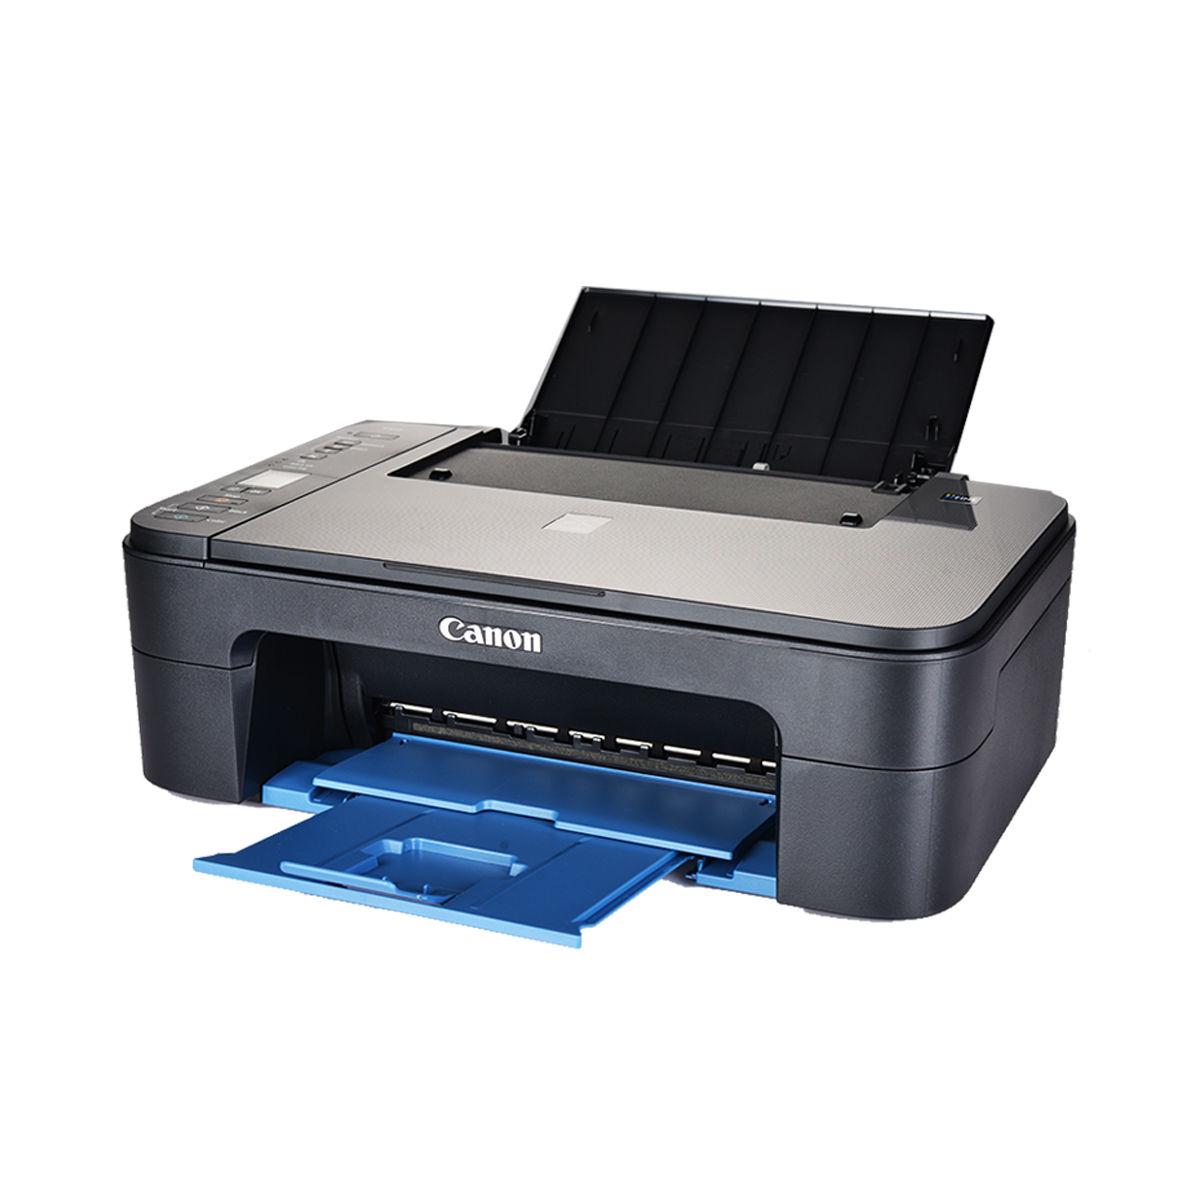 Canon All in One Wi Fi Printer